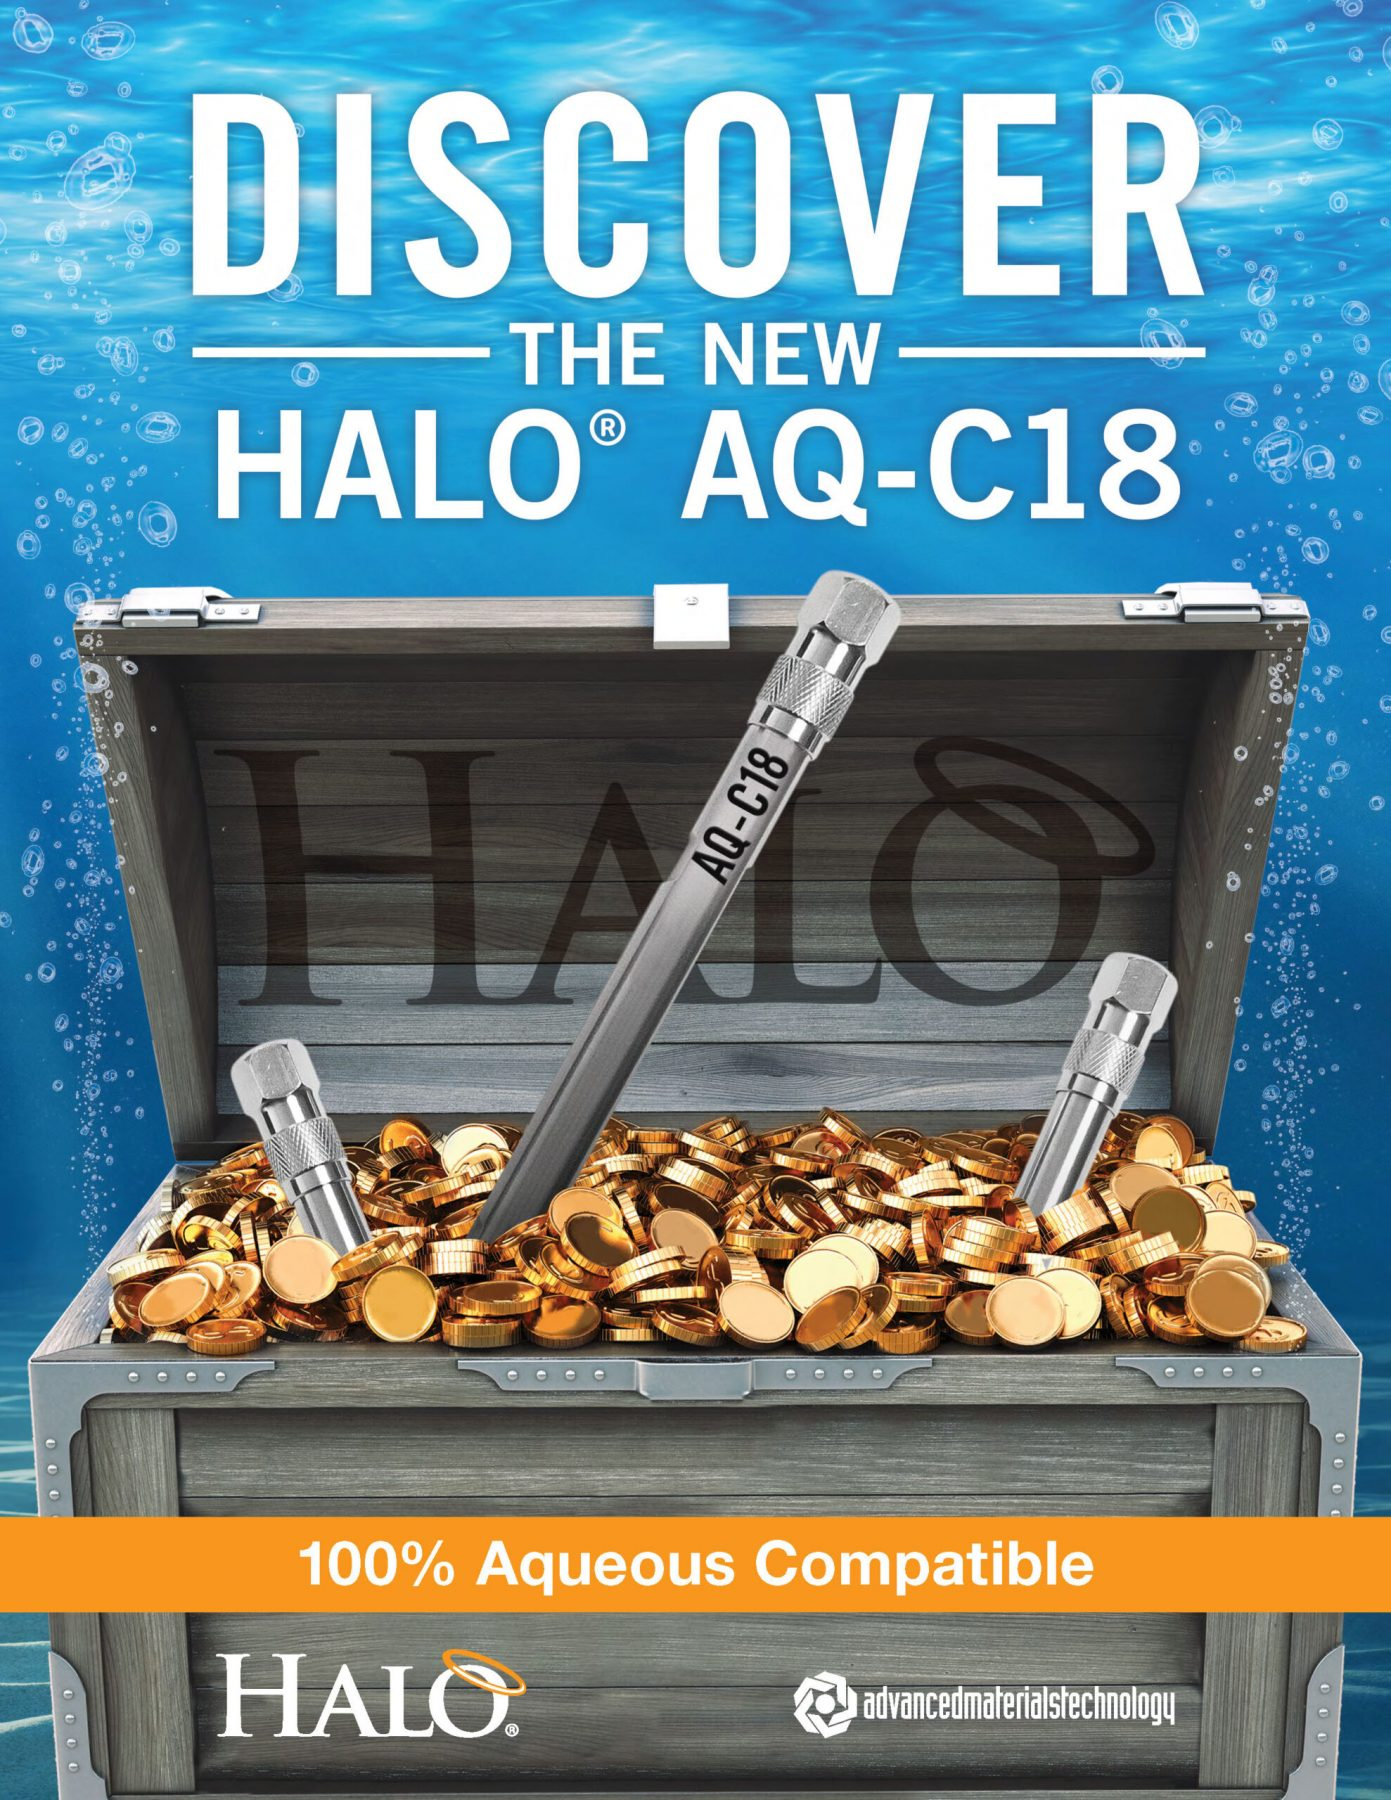 discover the new halo aq-c18 column